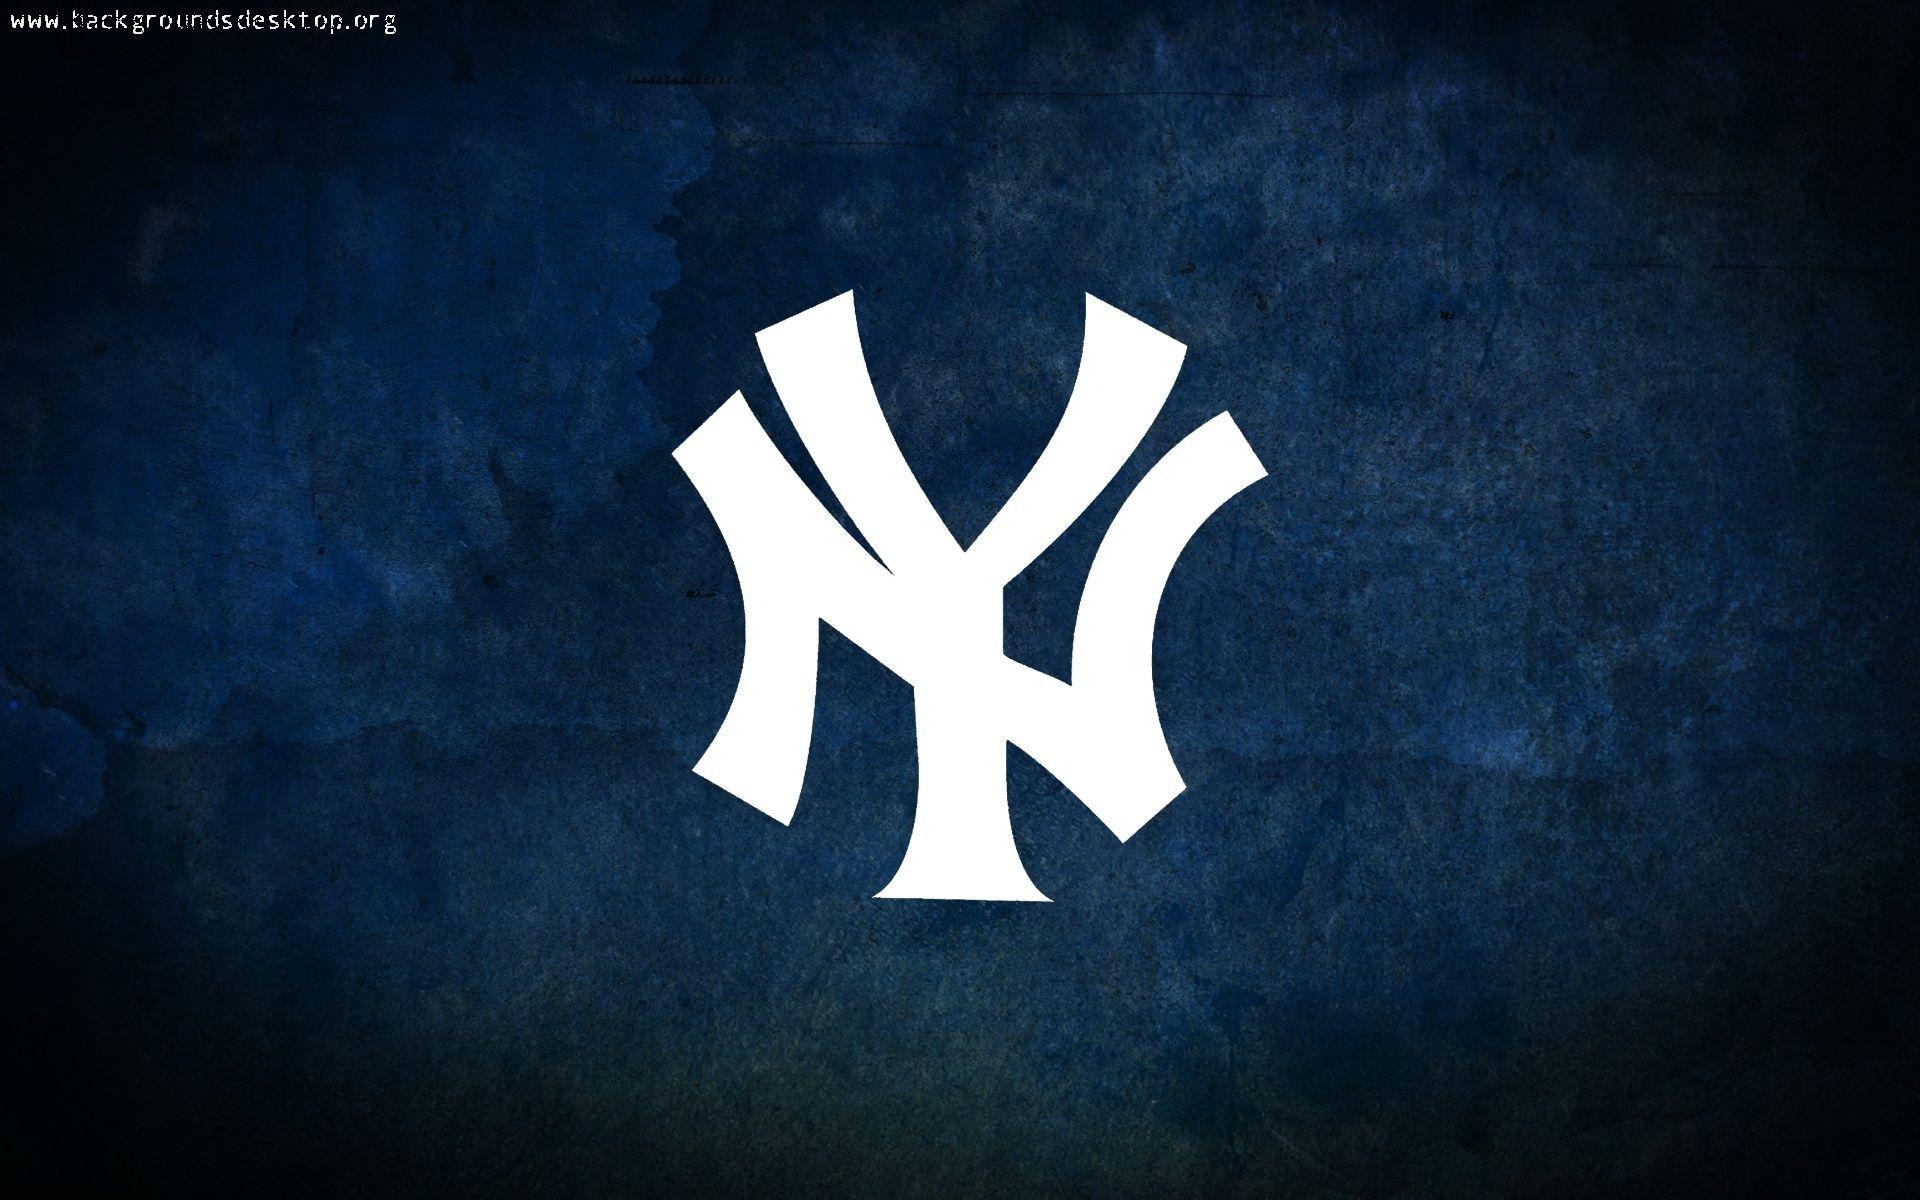 beautiful logo new york yankees wallpaper http